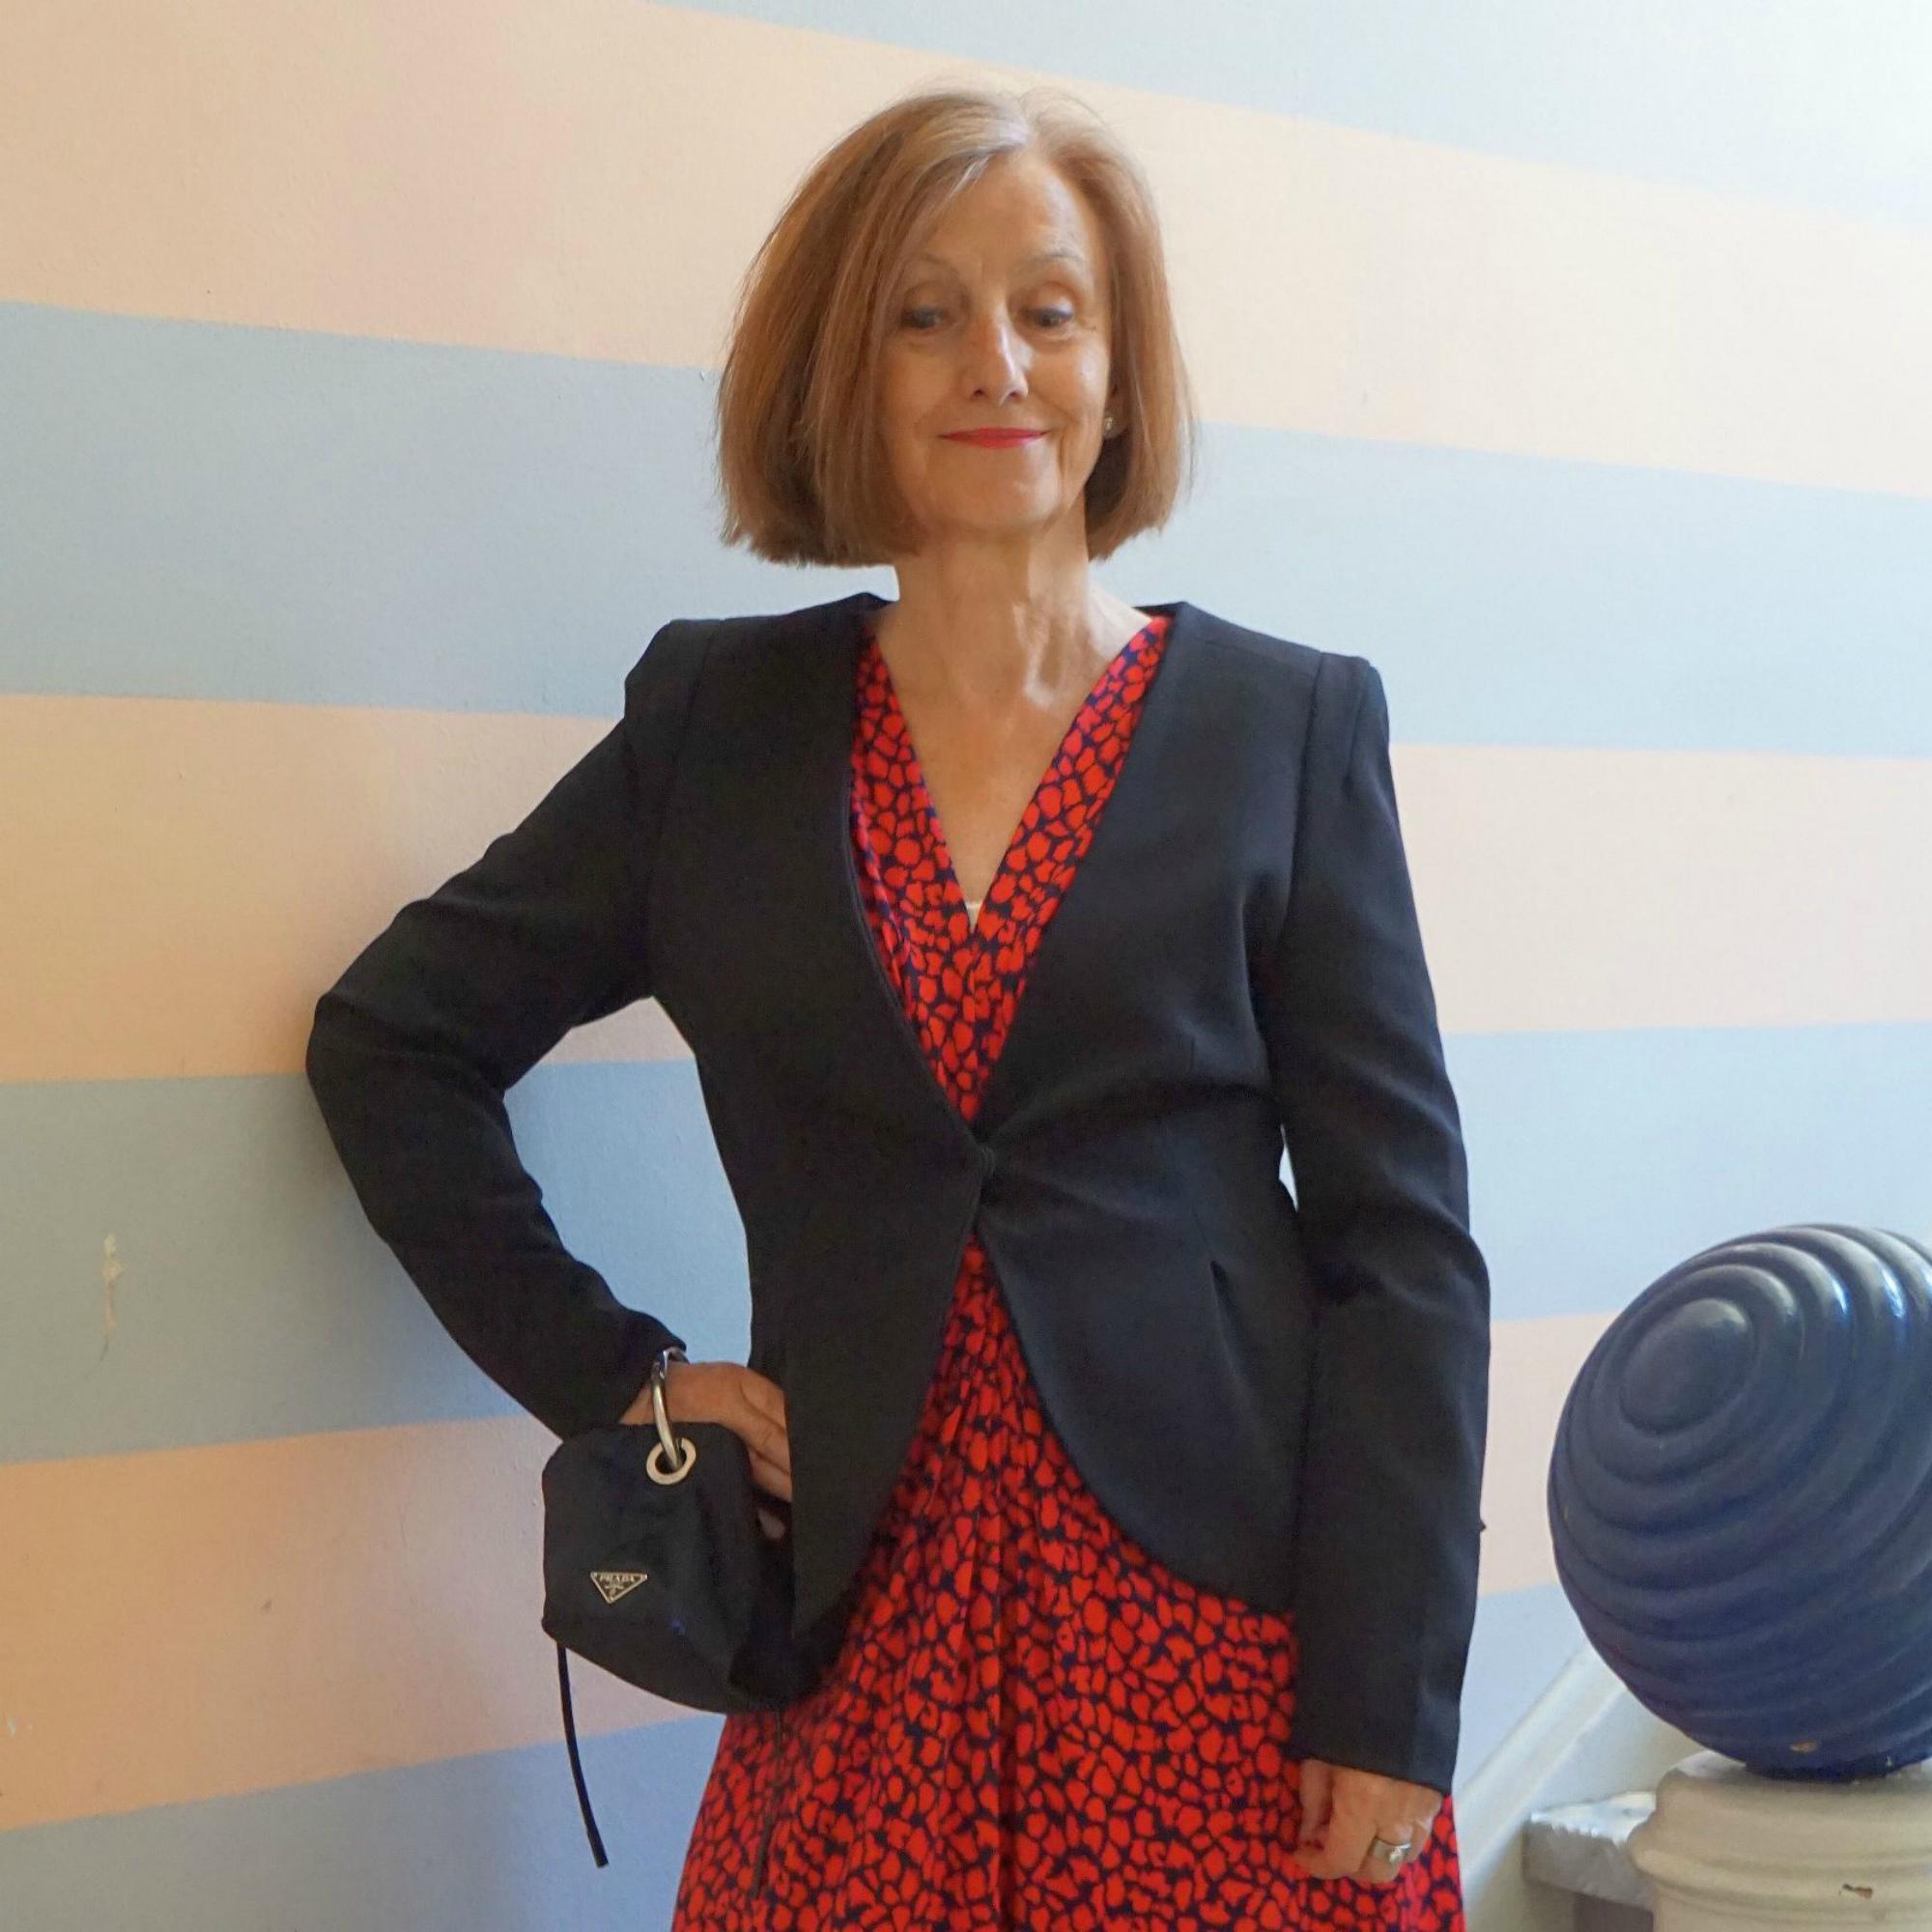 Ursel vom IKNMLO Fashionblog für Frauen ab 40 über Abiball-Alarm